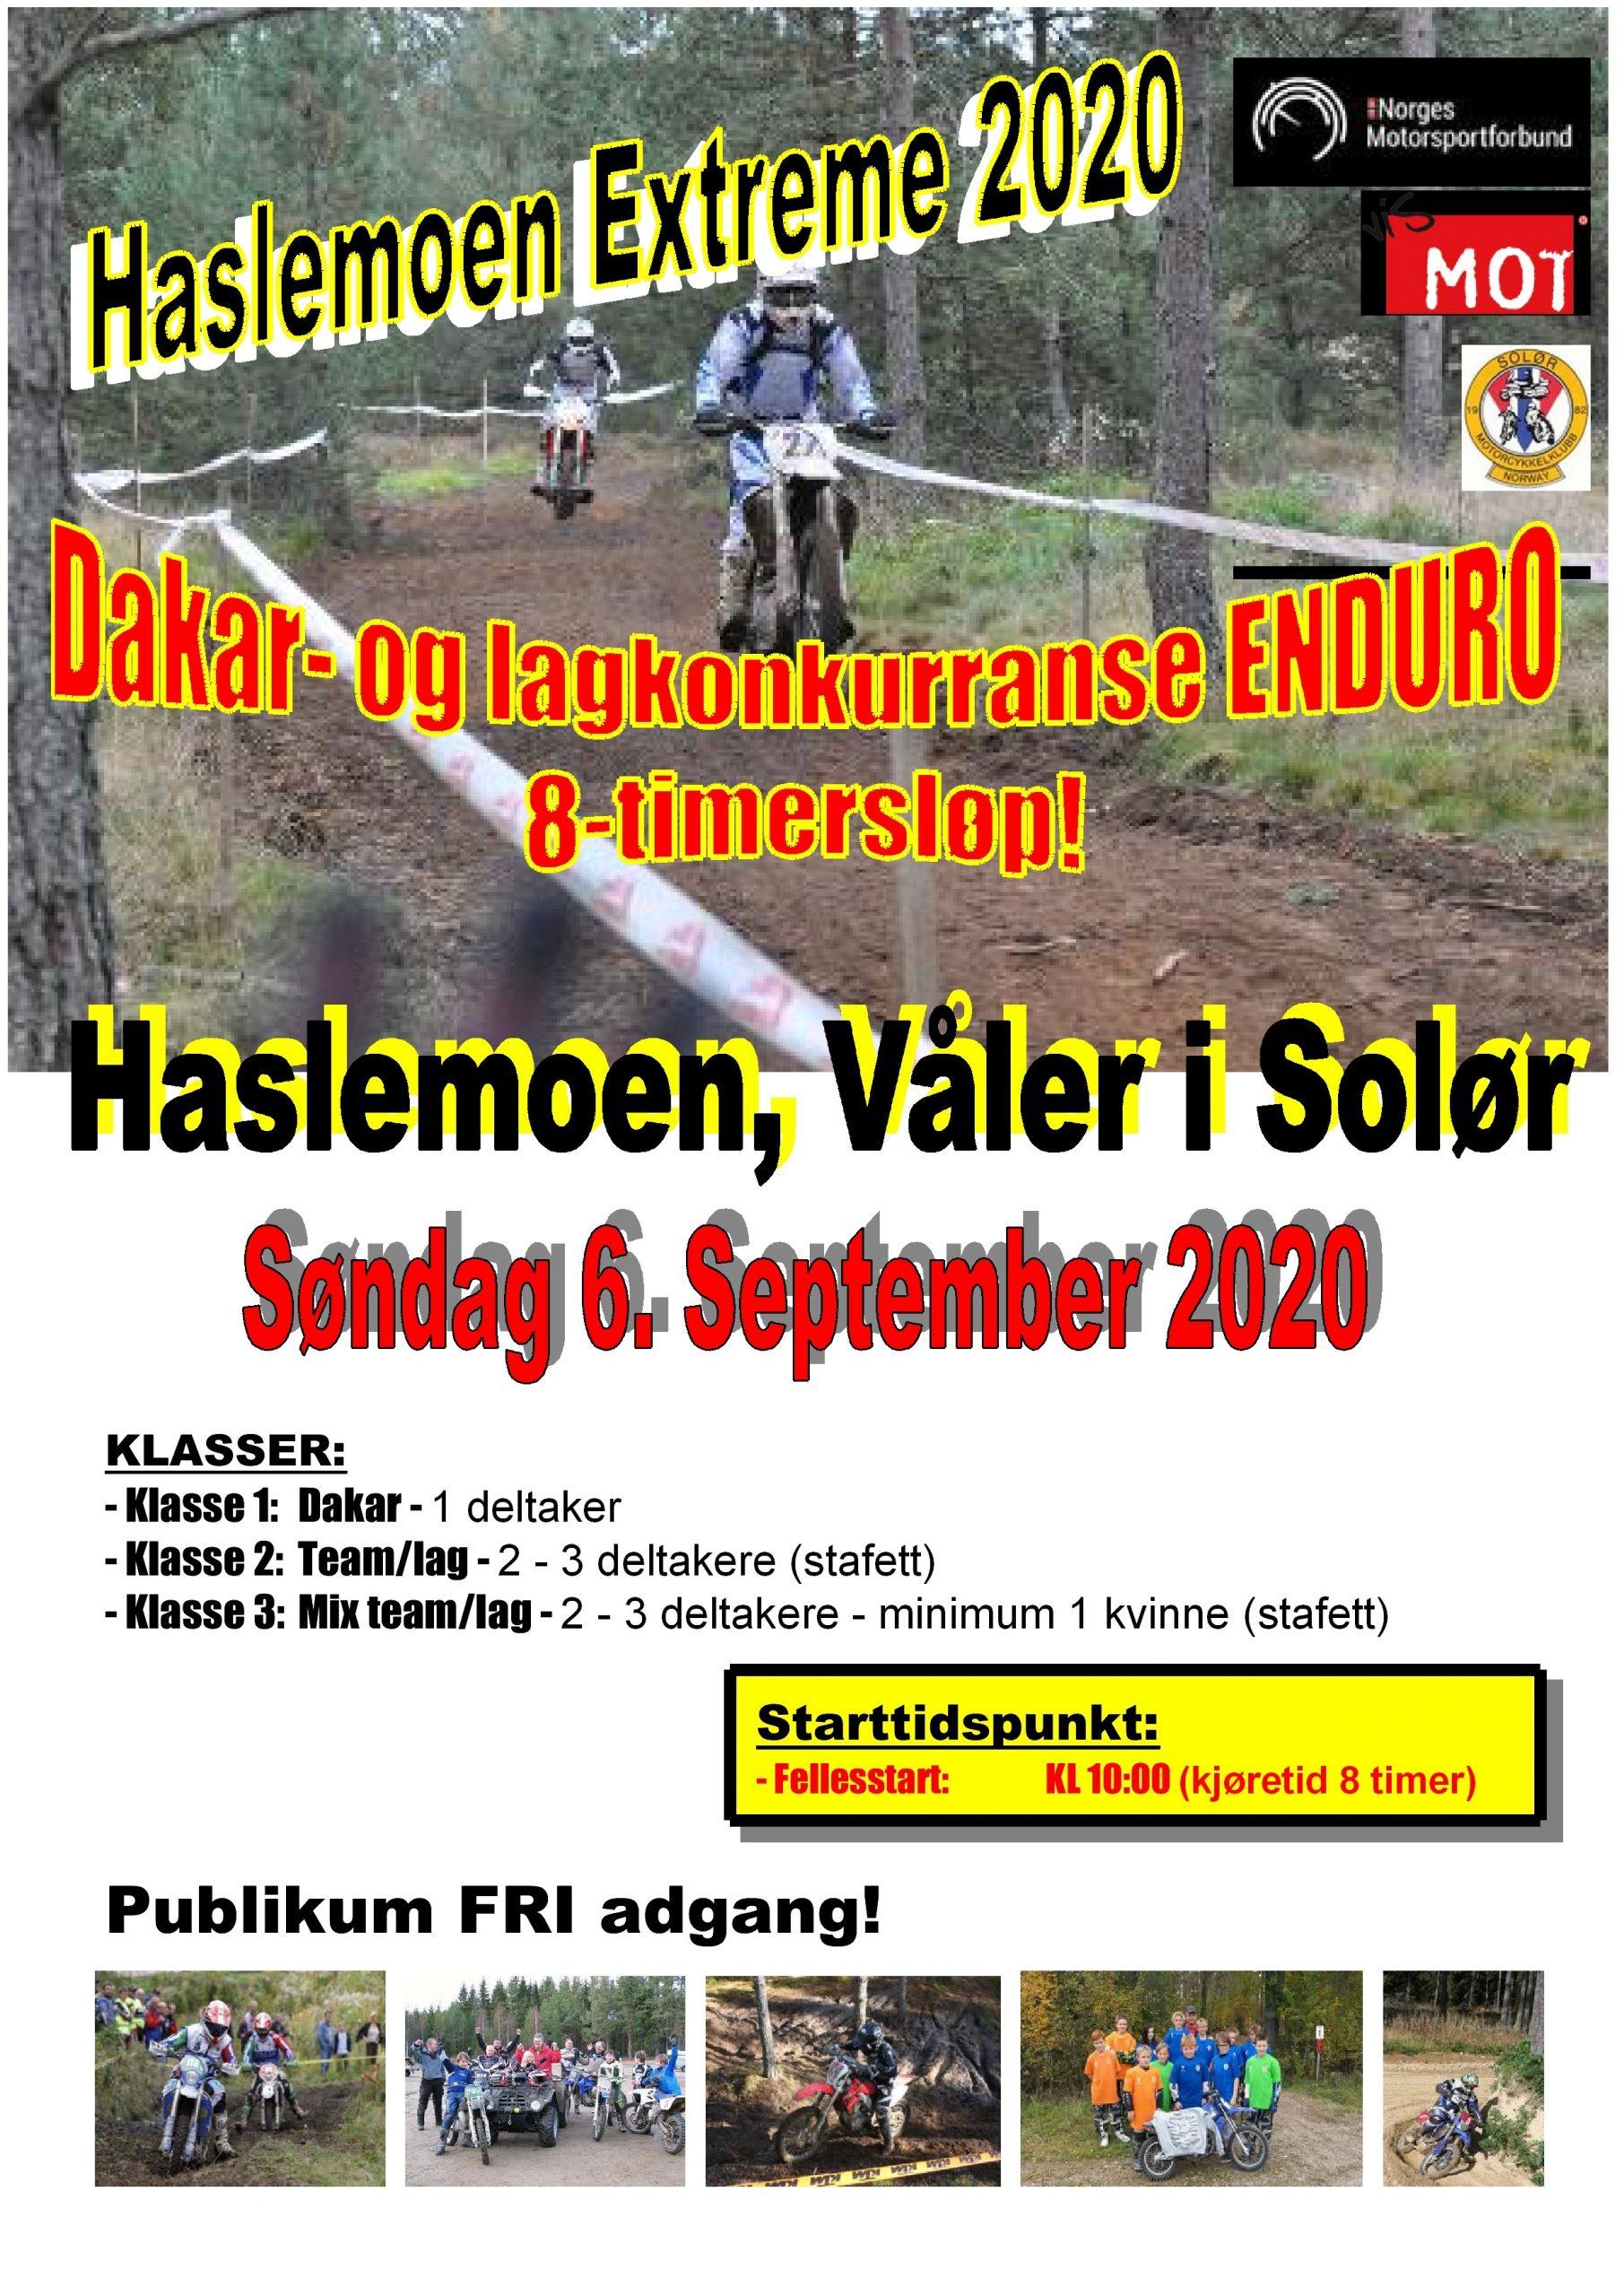 Poster HASLEMOEN EXTREME 2020